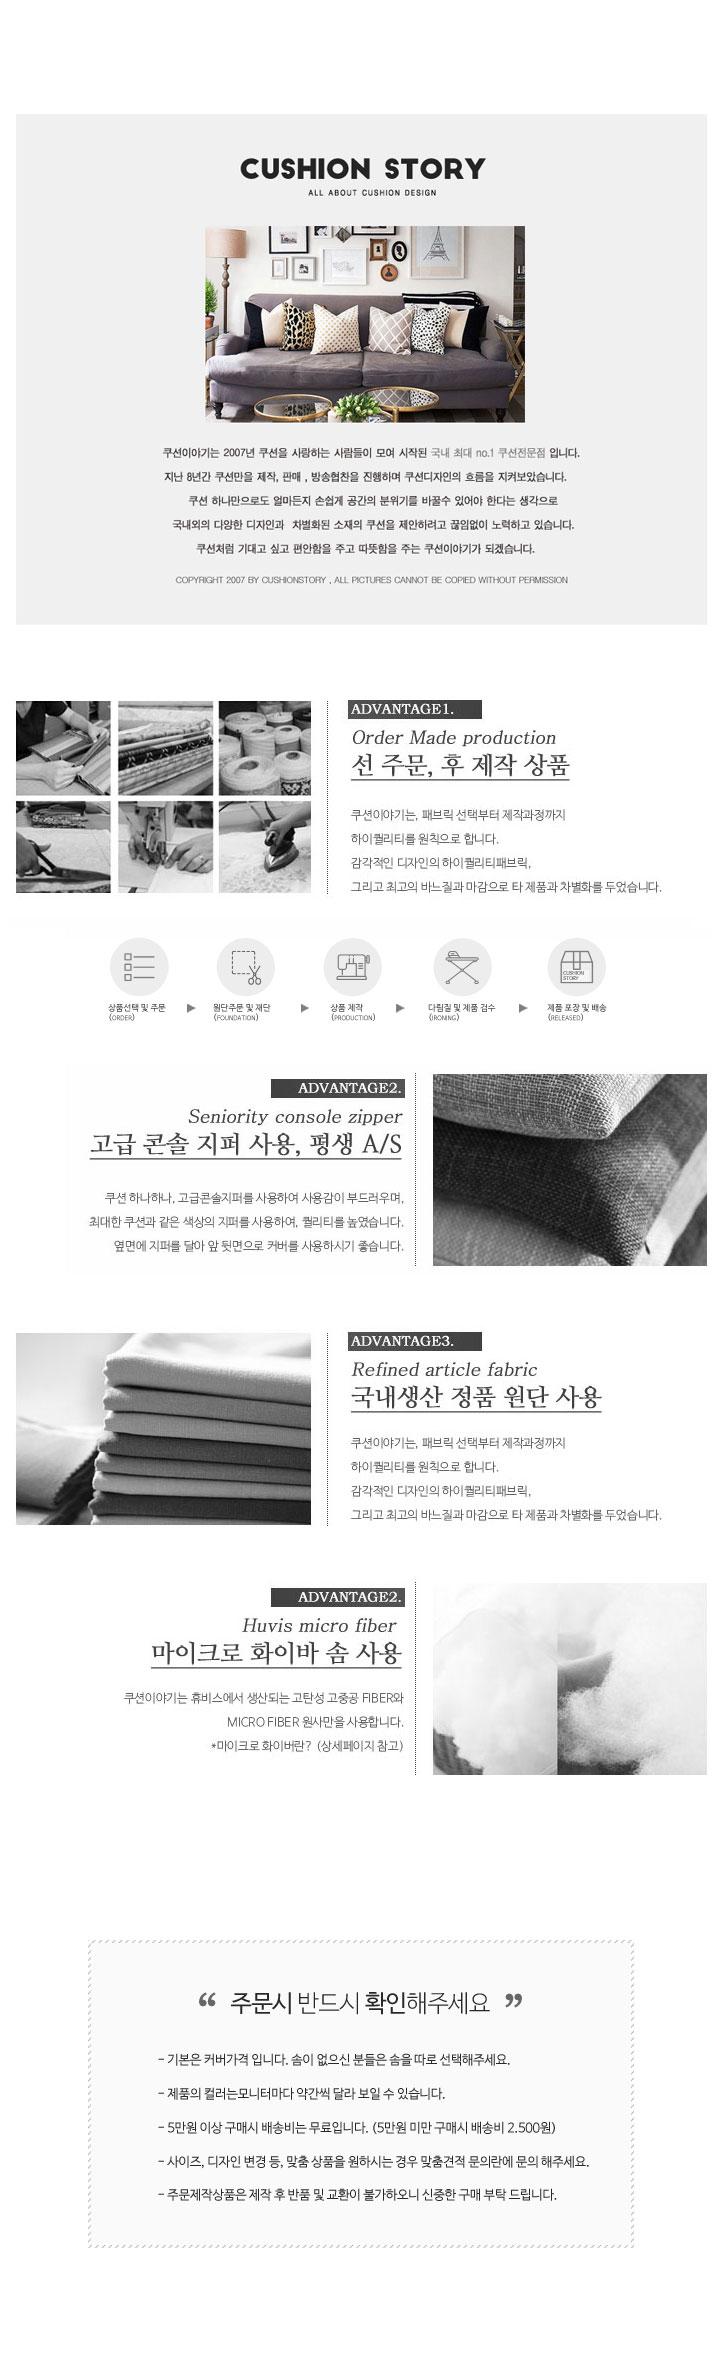 Mandy 맨디 (no1-no4) 방석 쿠션 - 쿠션이야기, 18,100원, 쿠션, 무지/솔리드